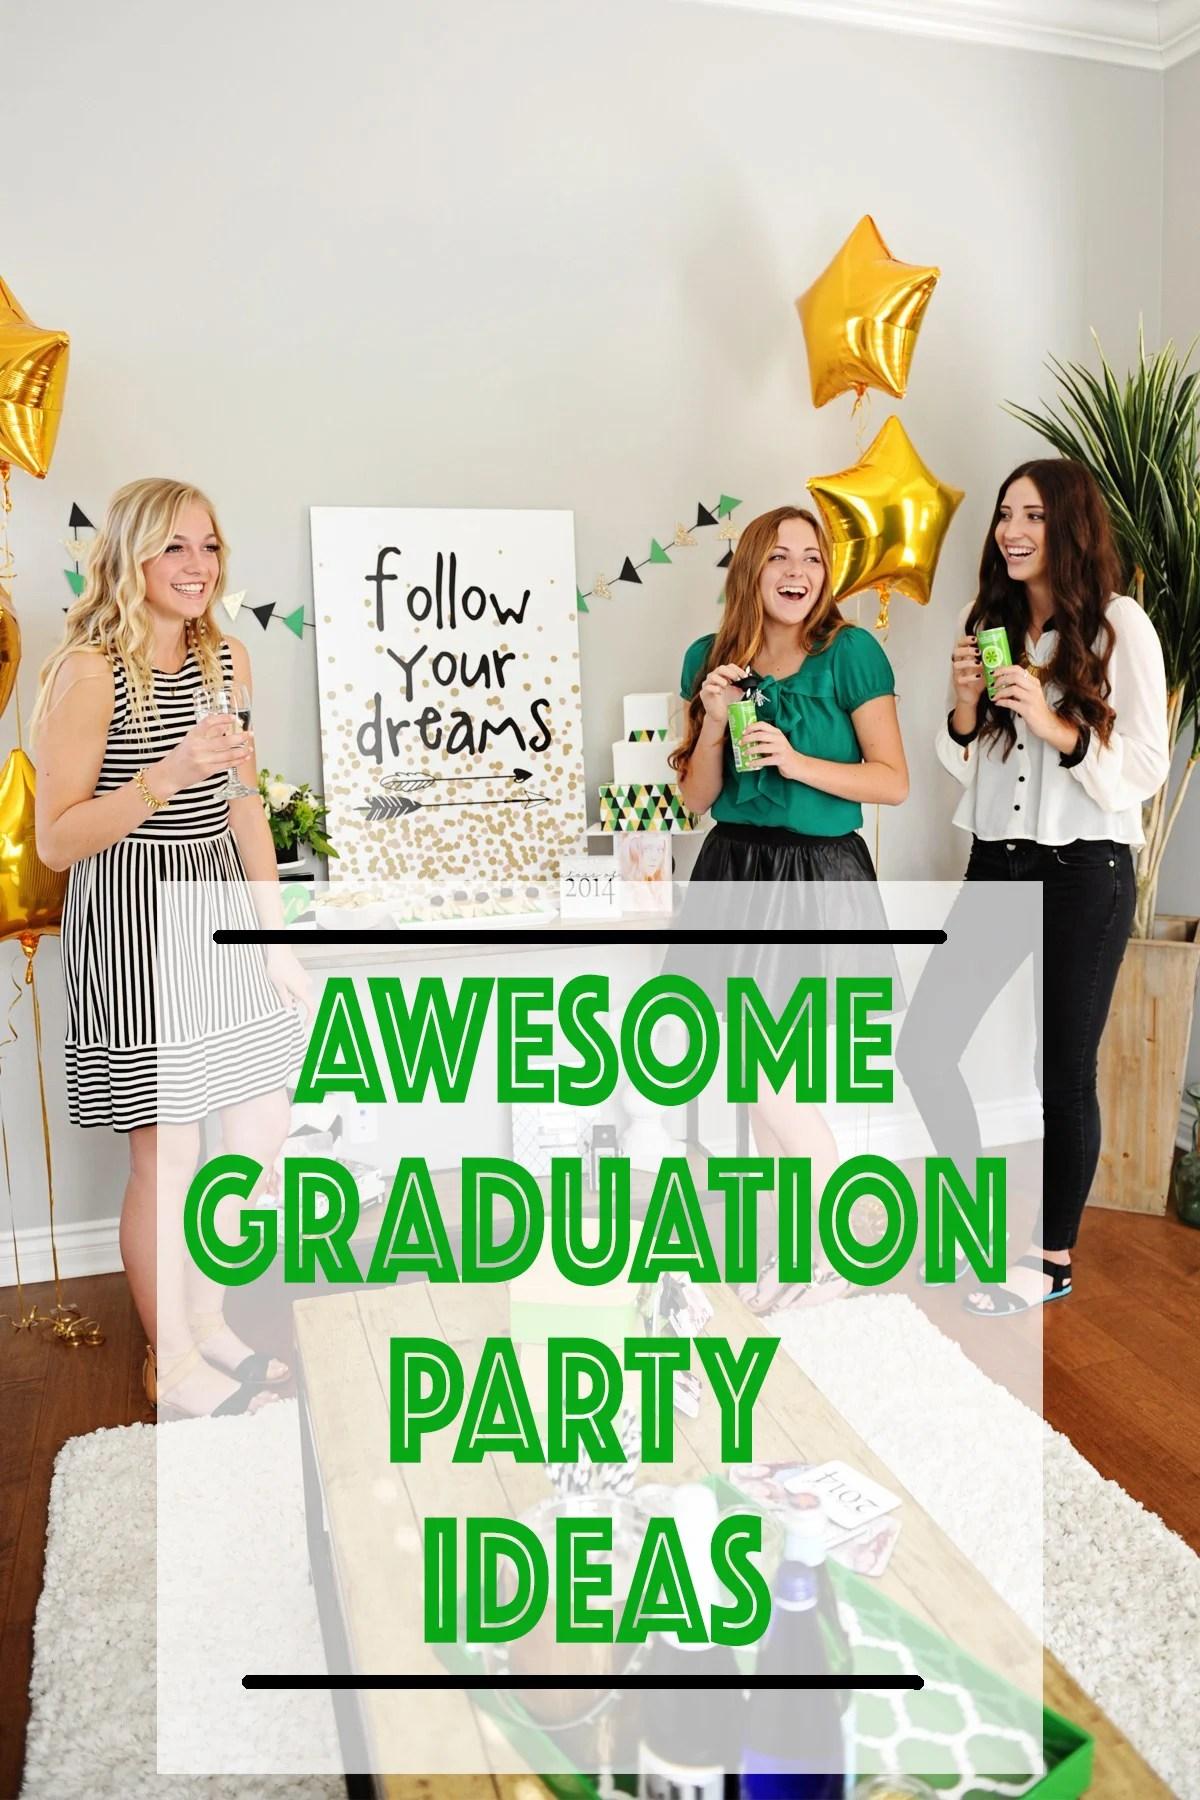 Graduation Party Ideas : Follow Your Dreams